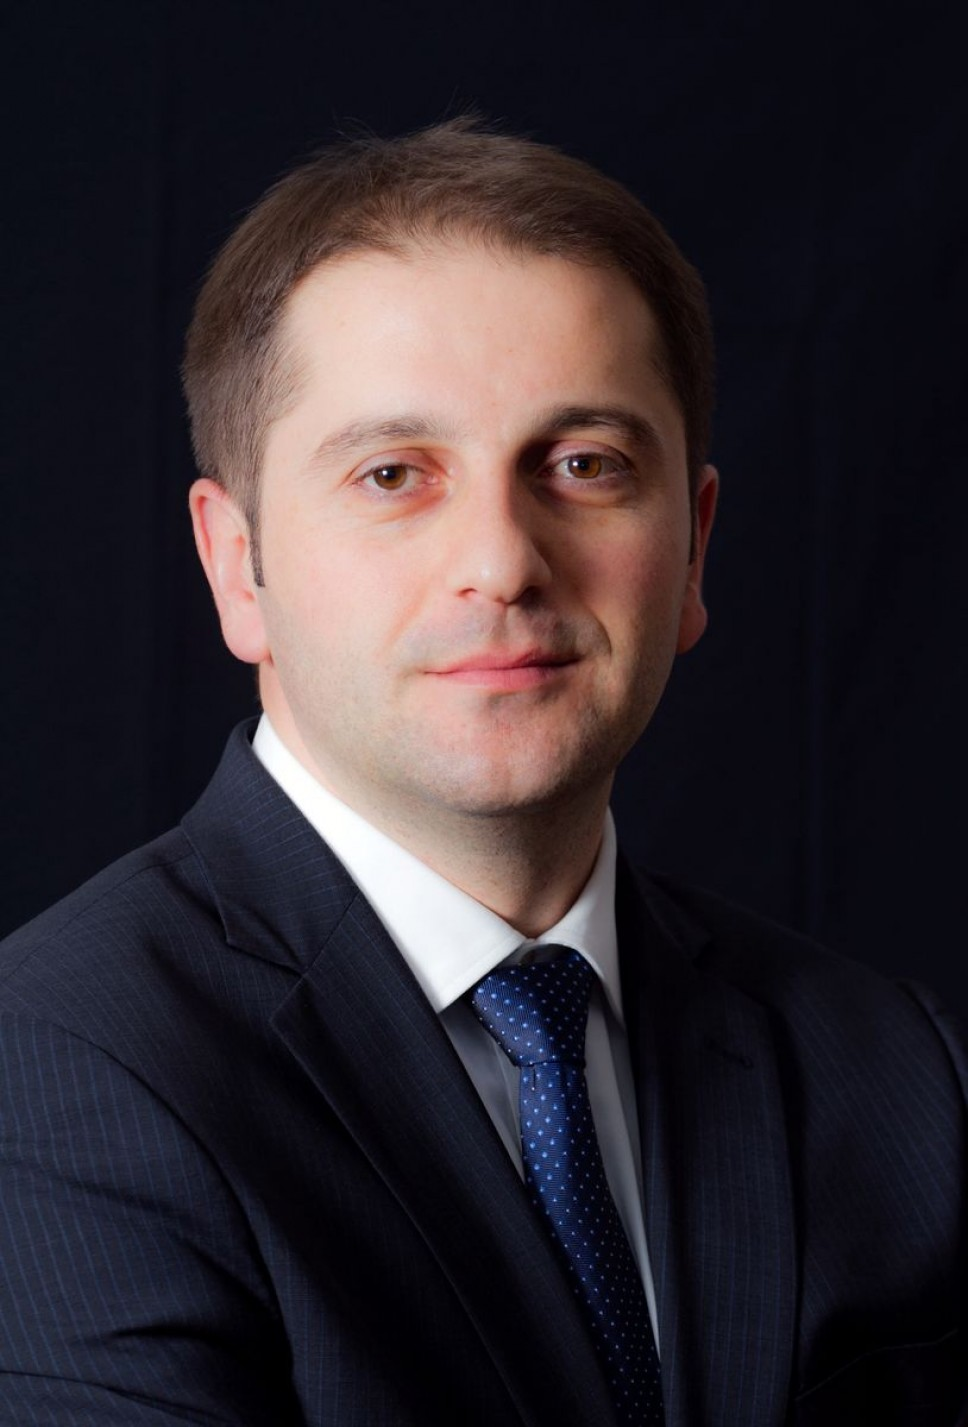 Biografija - Šehović Damir